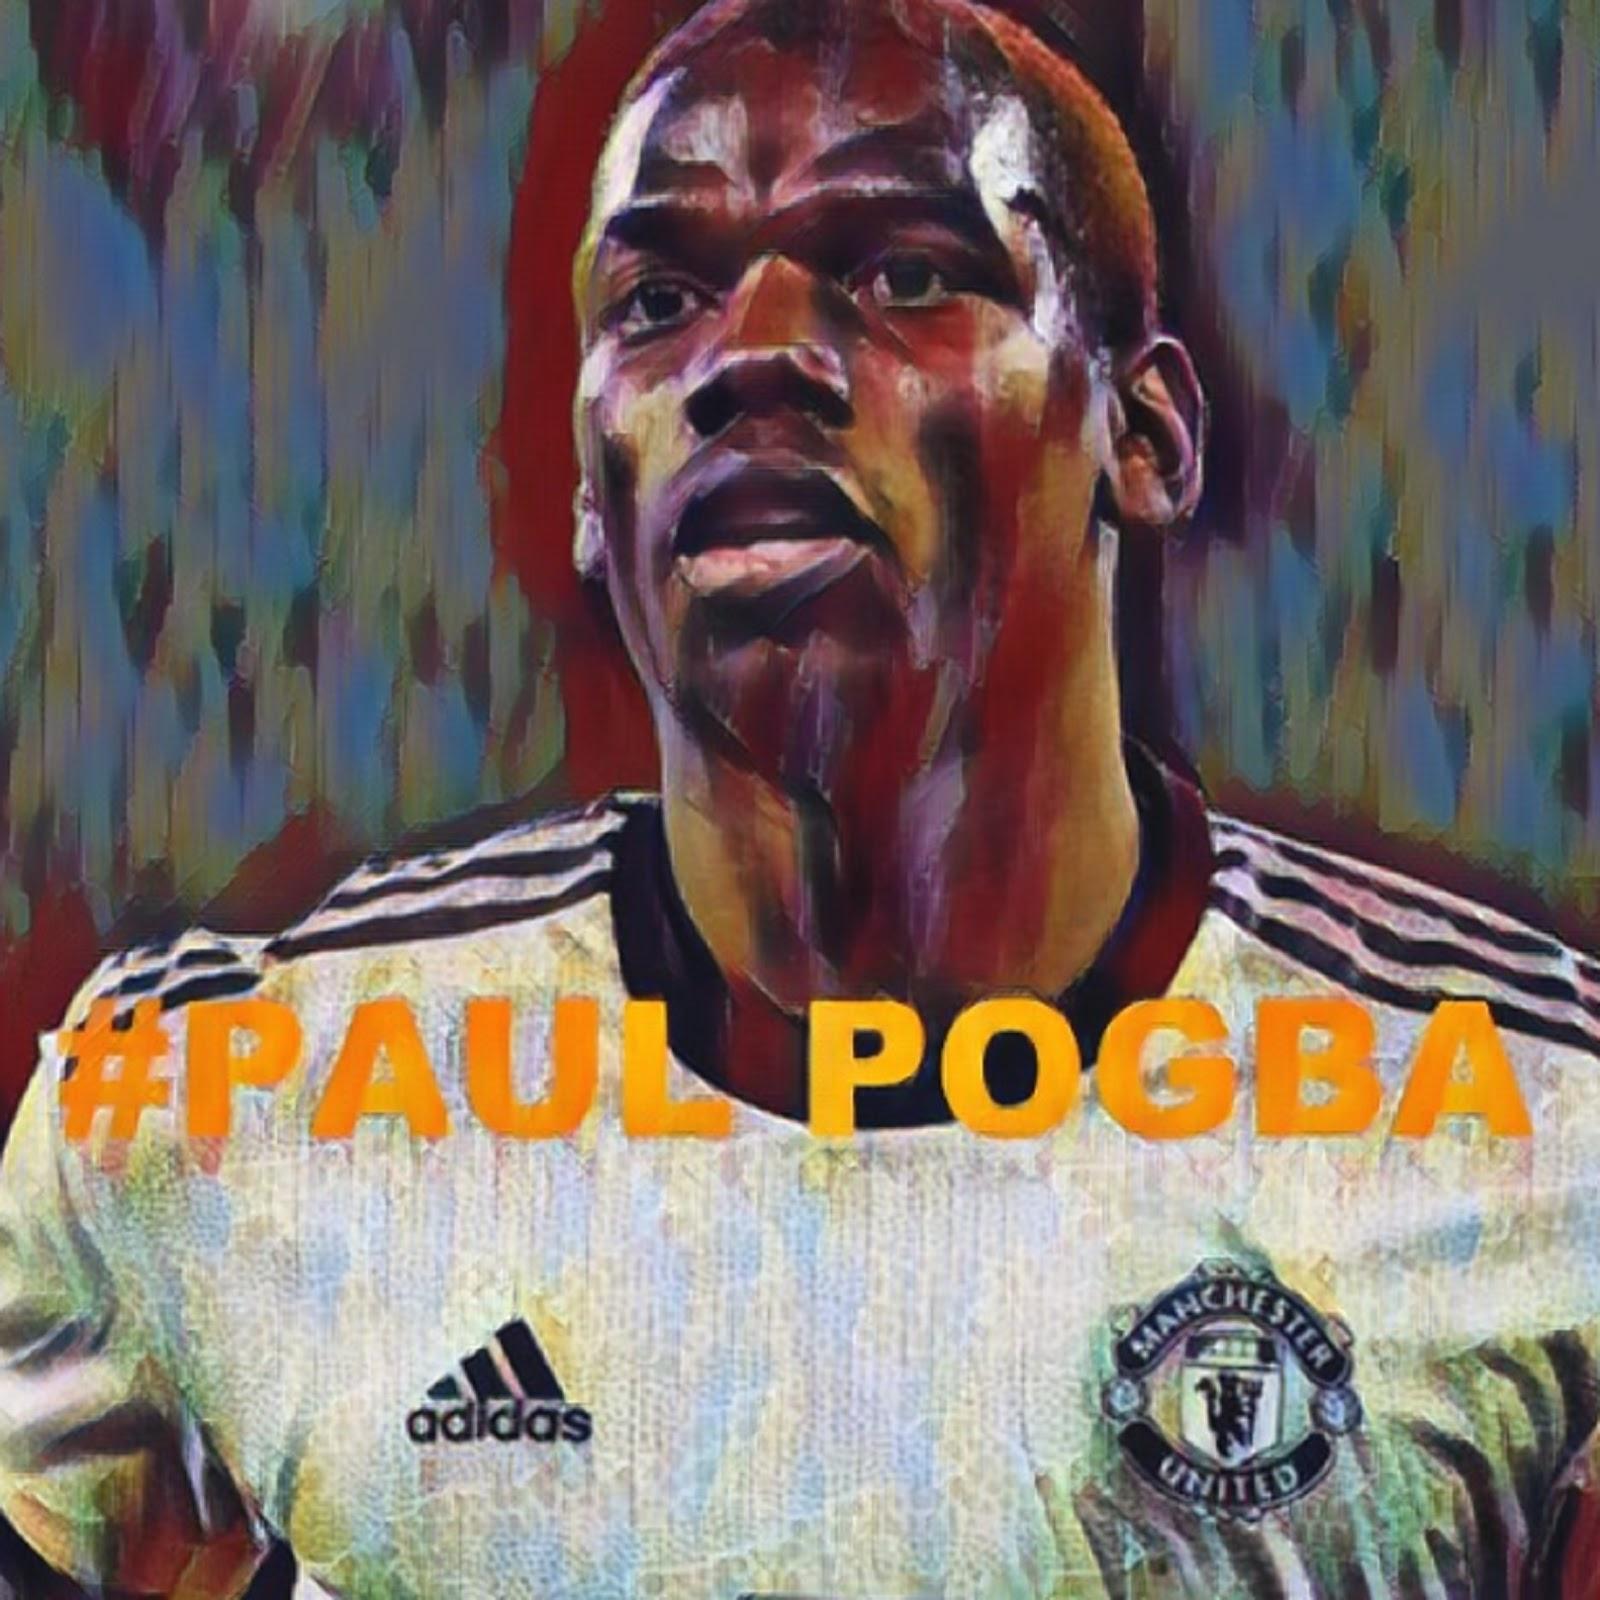 PAUL POGBA 2